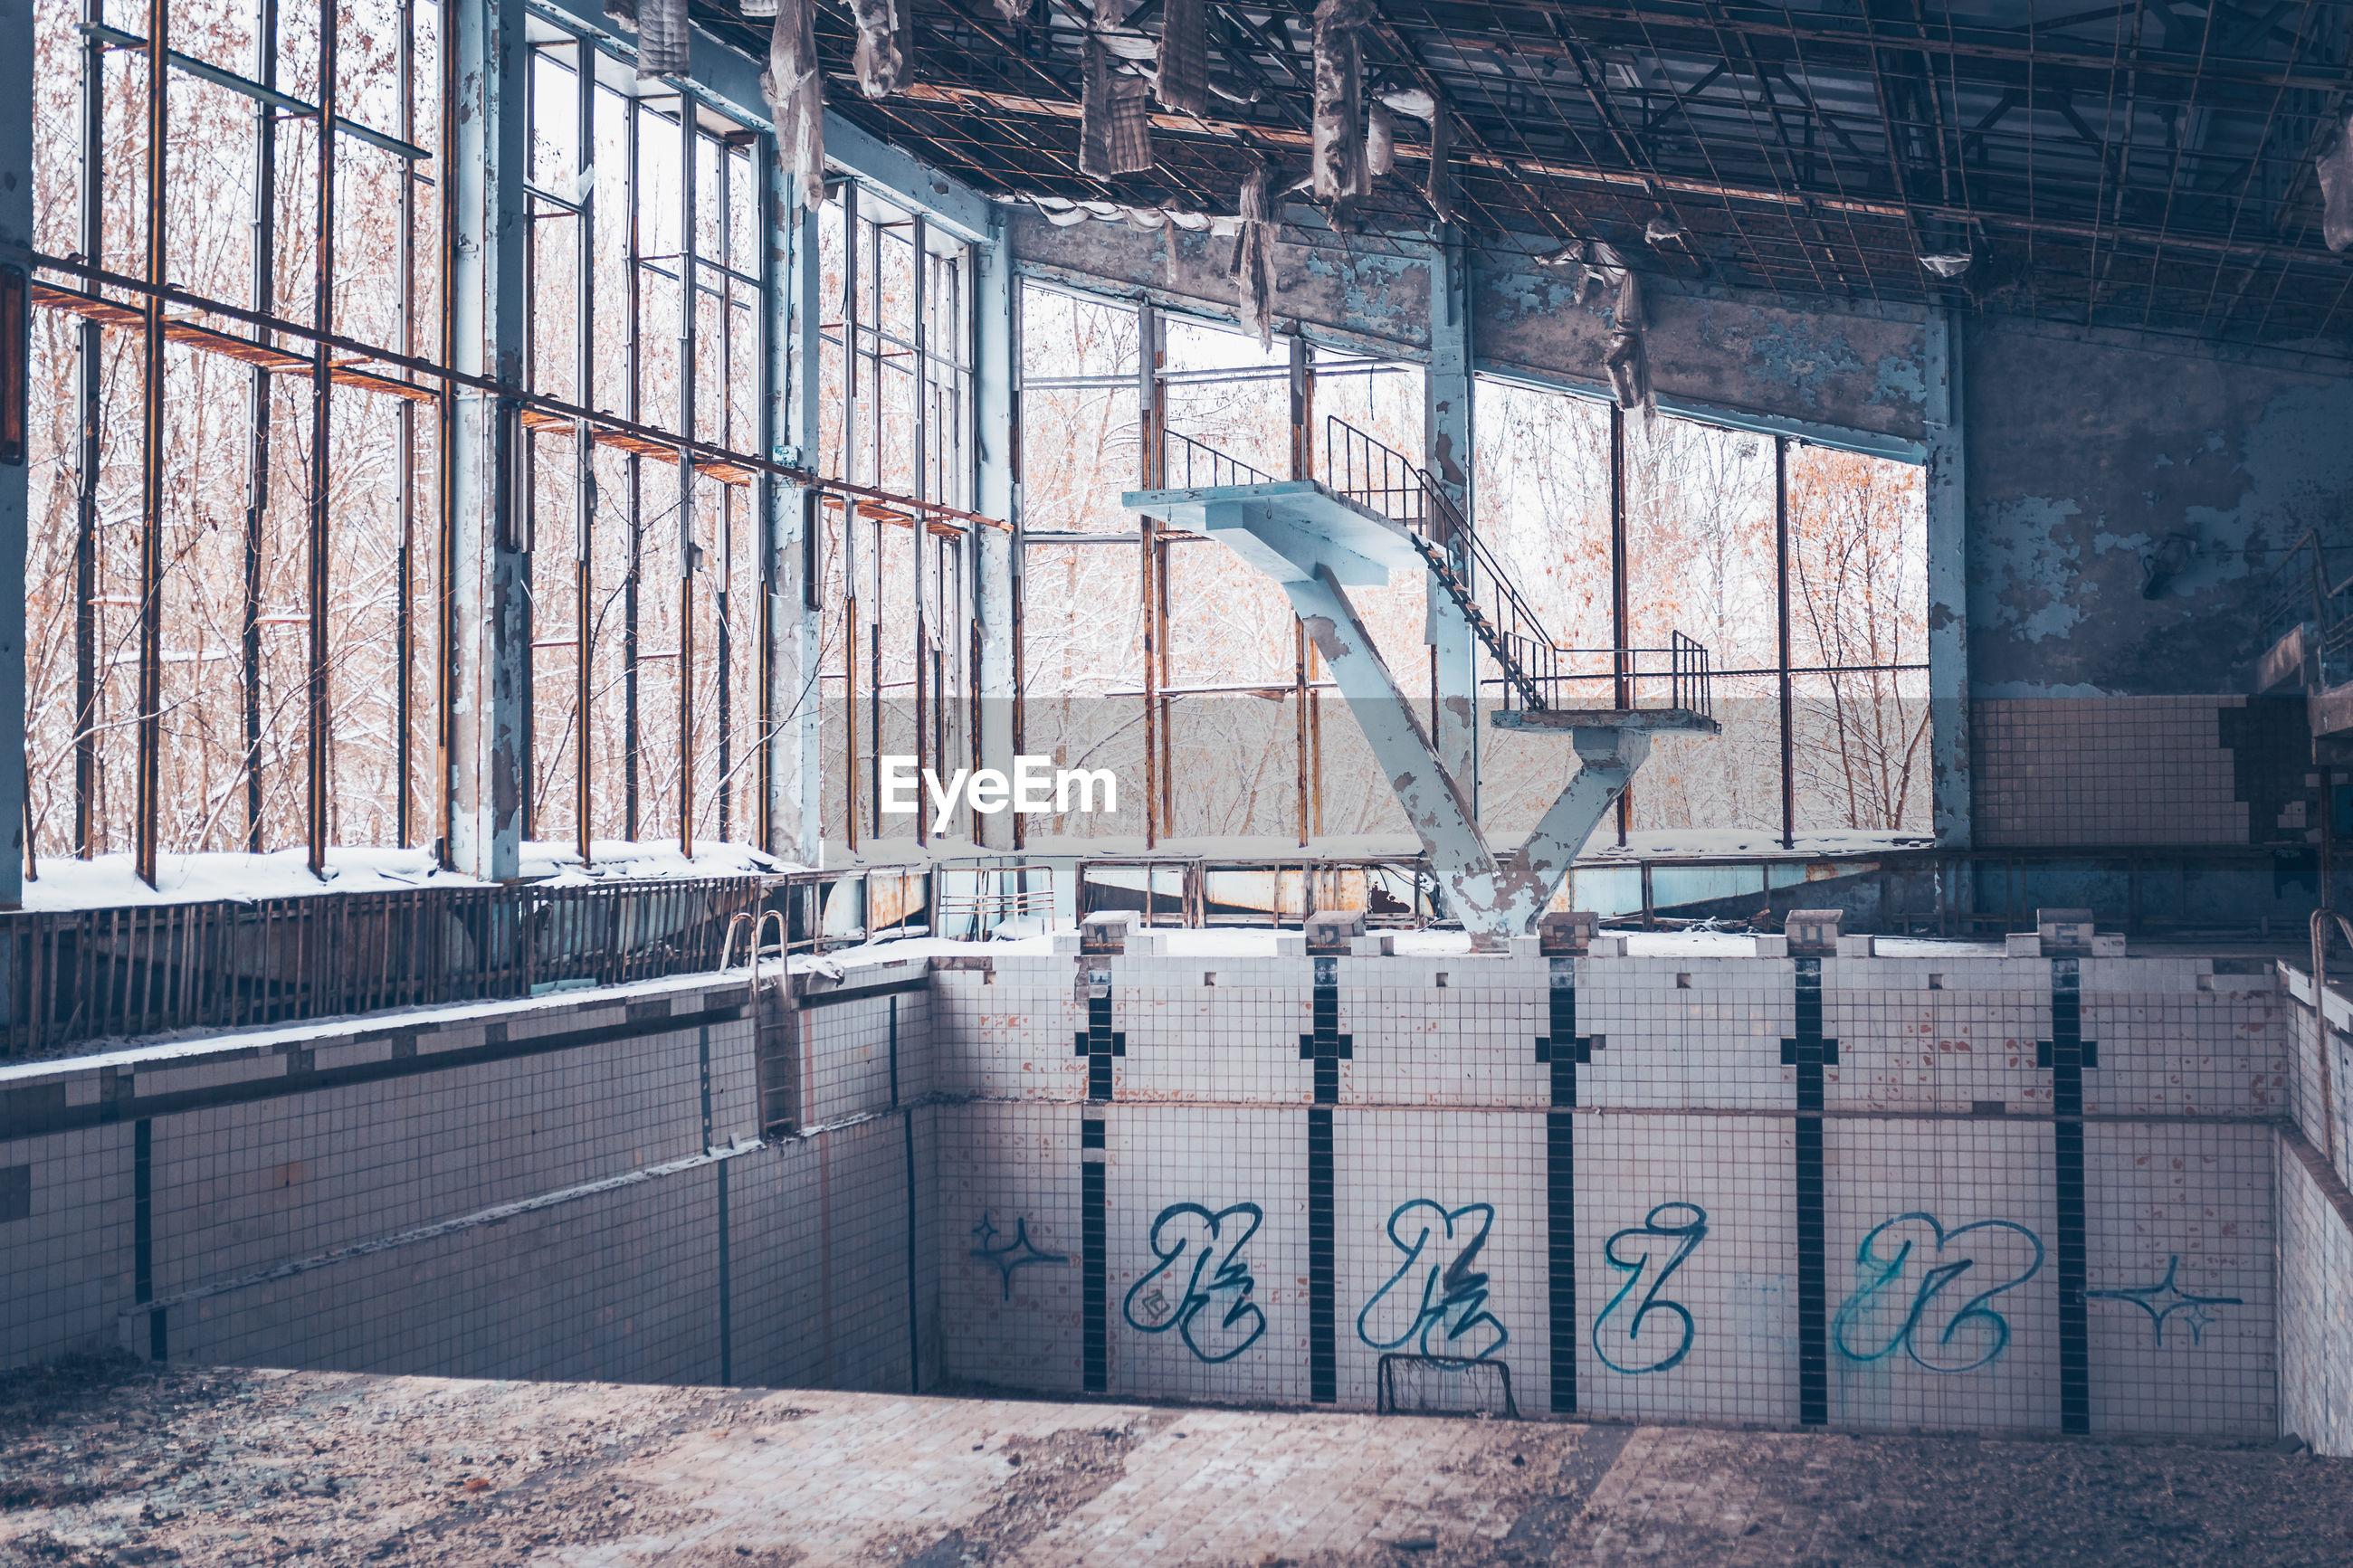 Abandoned building in chernobyl zone at pripyat